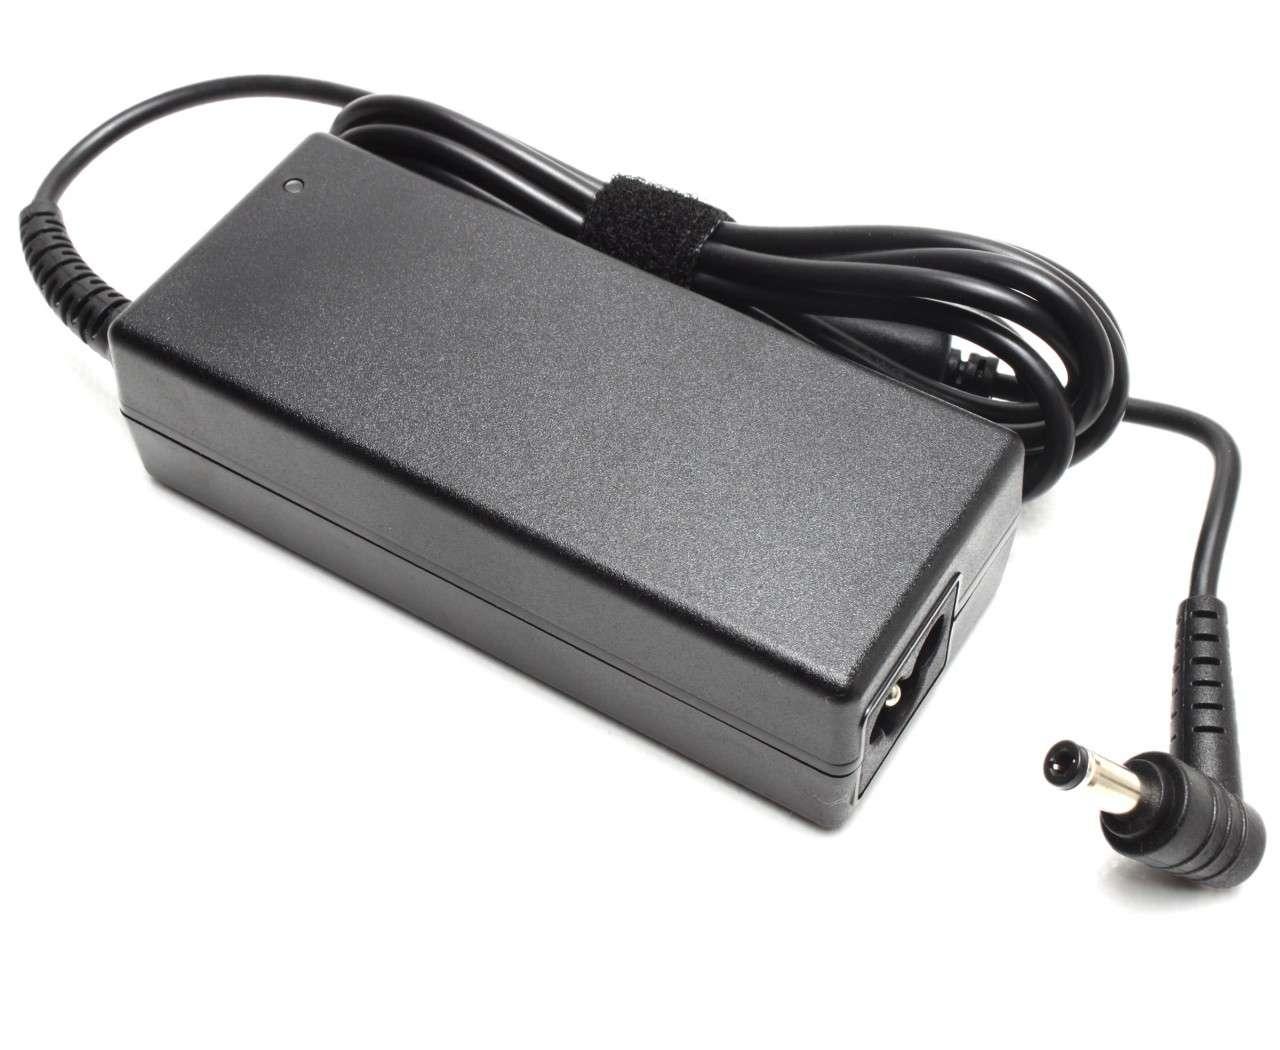 Incarcator Advent 340S2 imagine powerlaptop.ro 2021